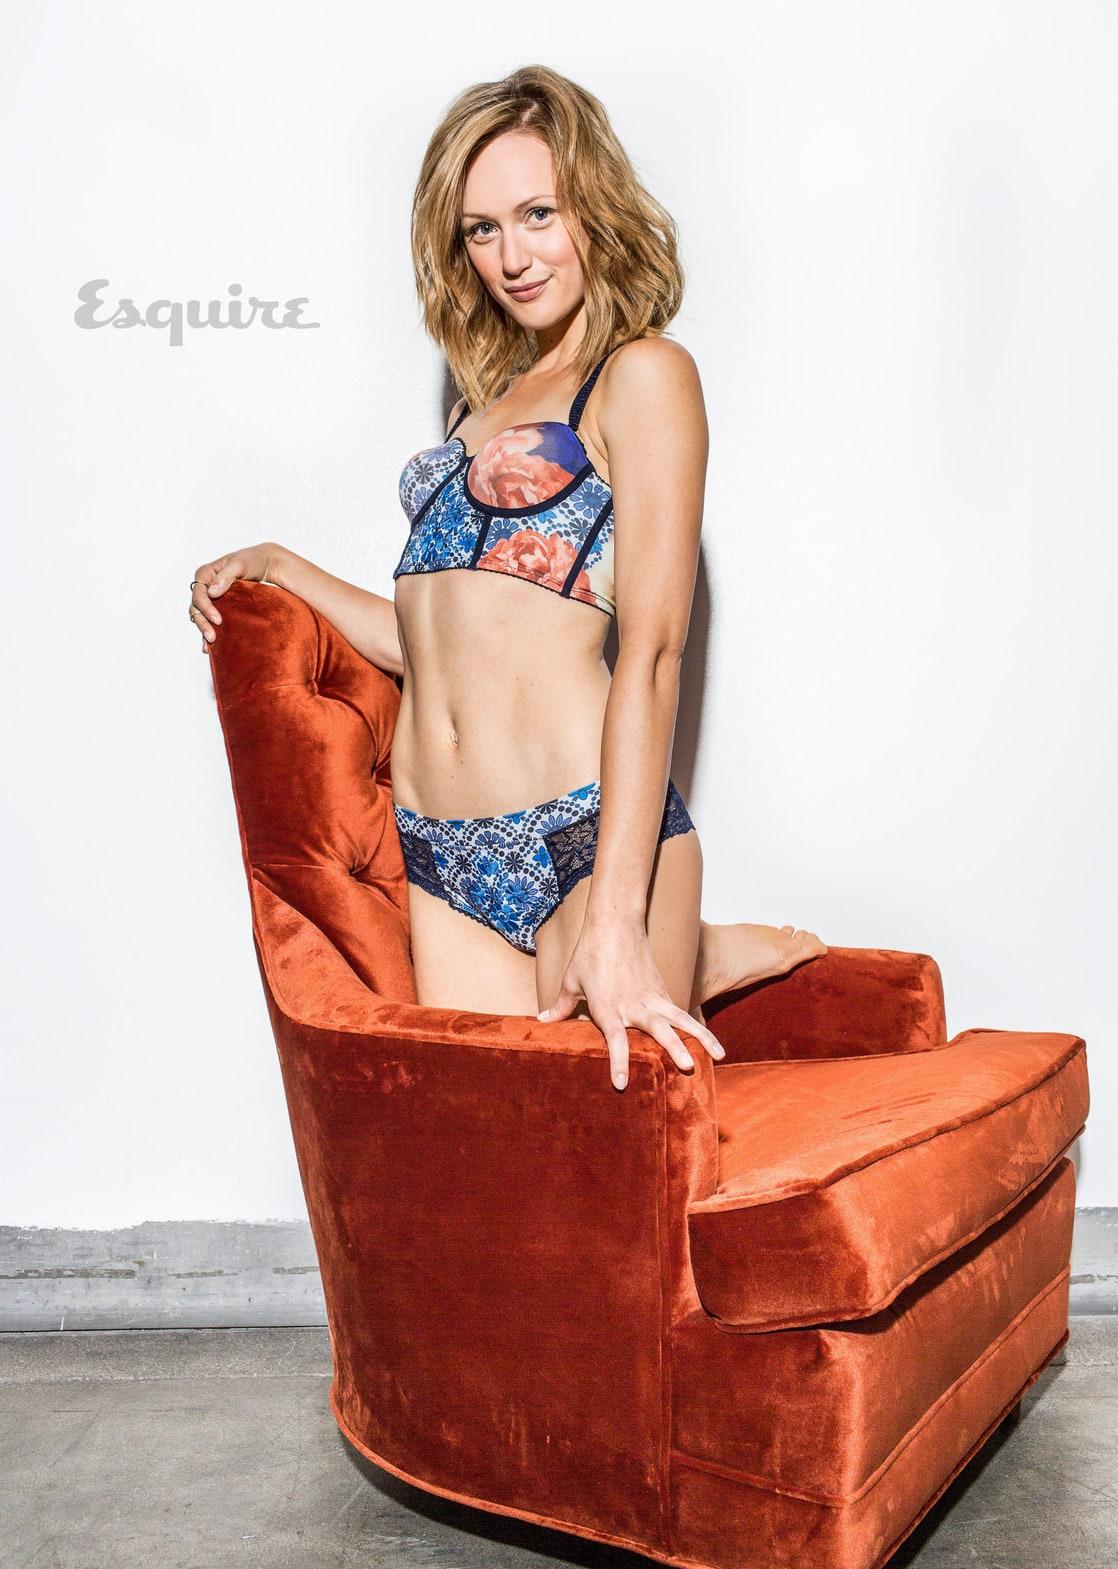 Kym Graham nudes (49 photo), Pussy, Leaked, Twitter, underwear 2020